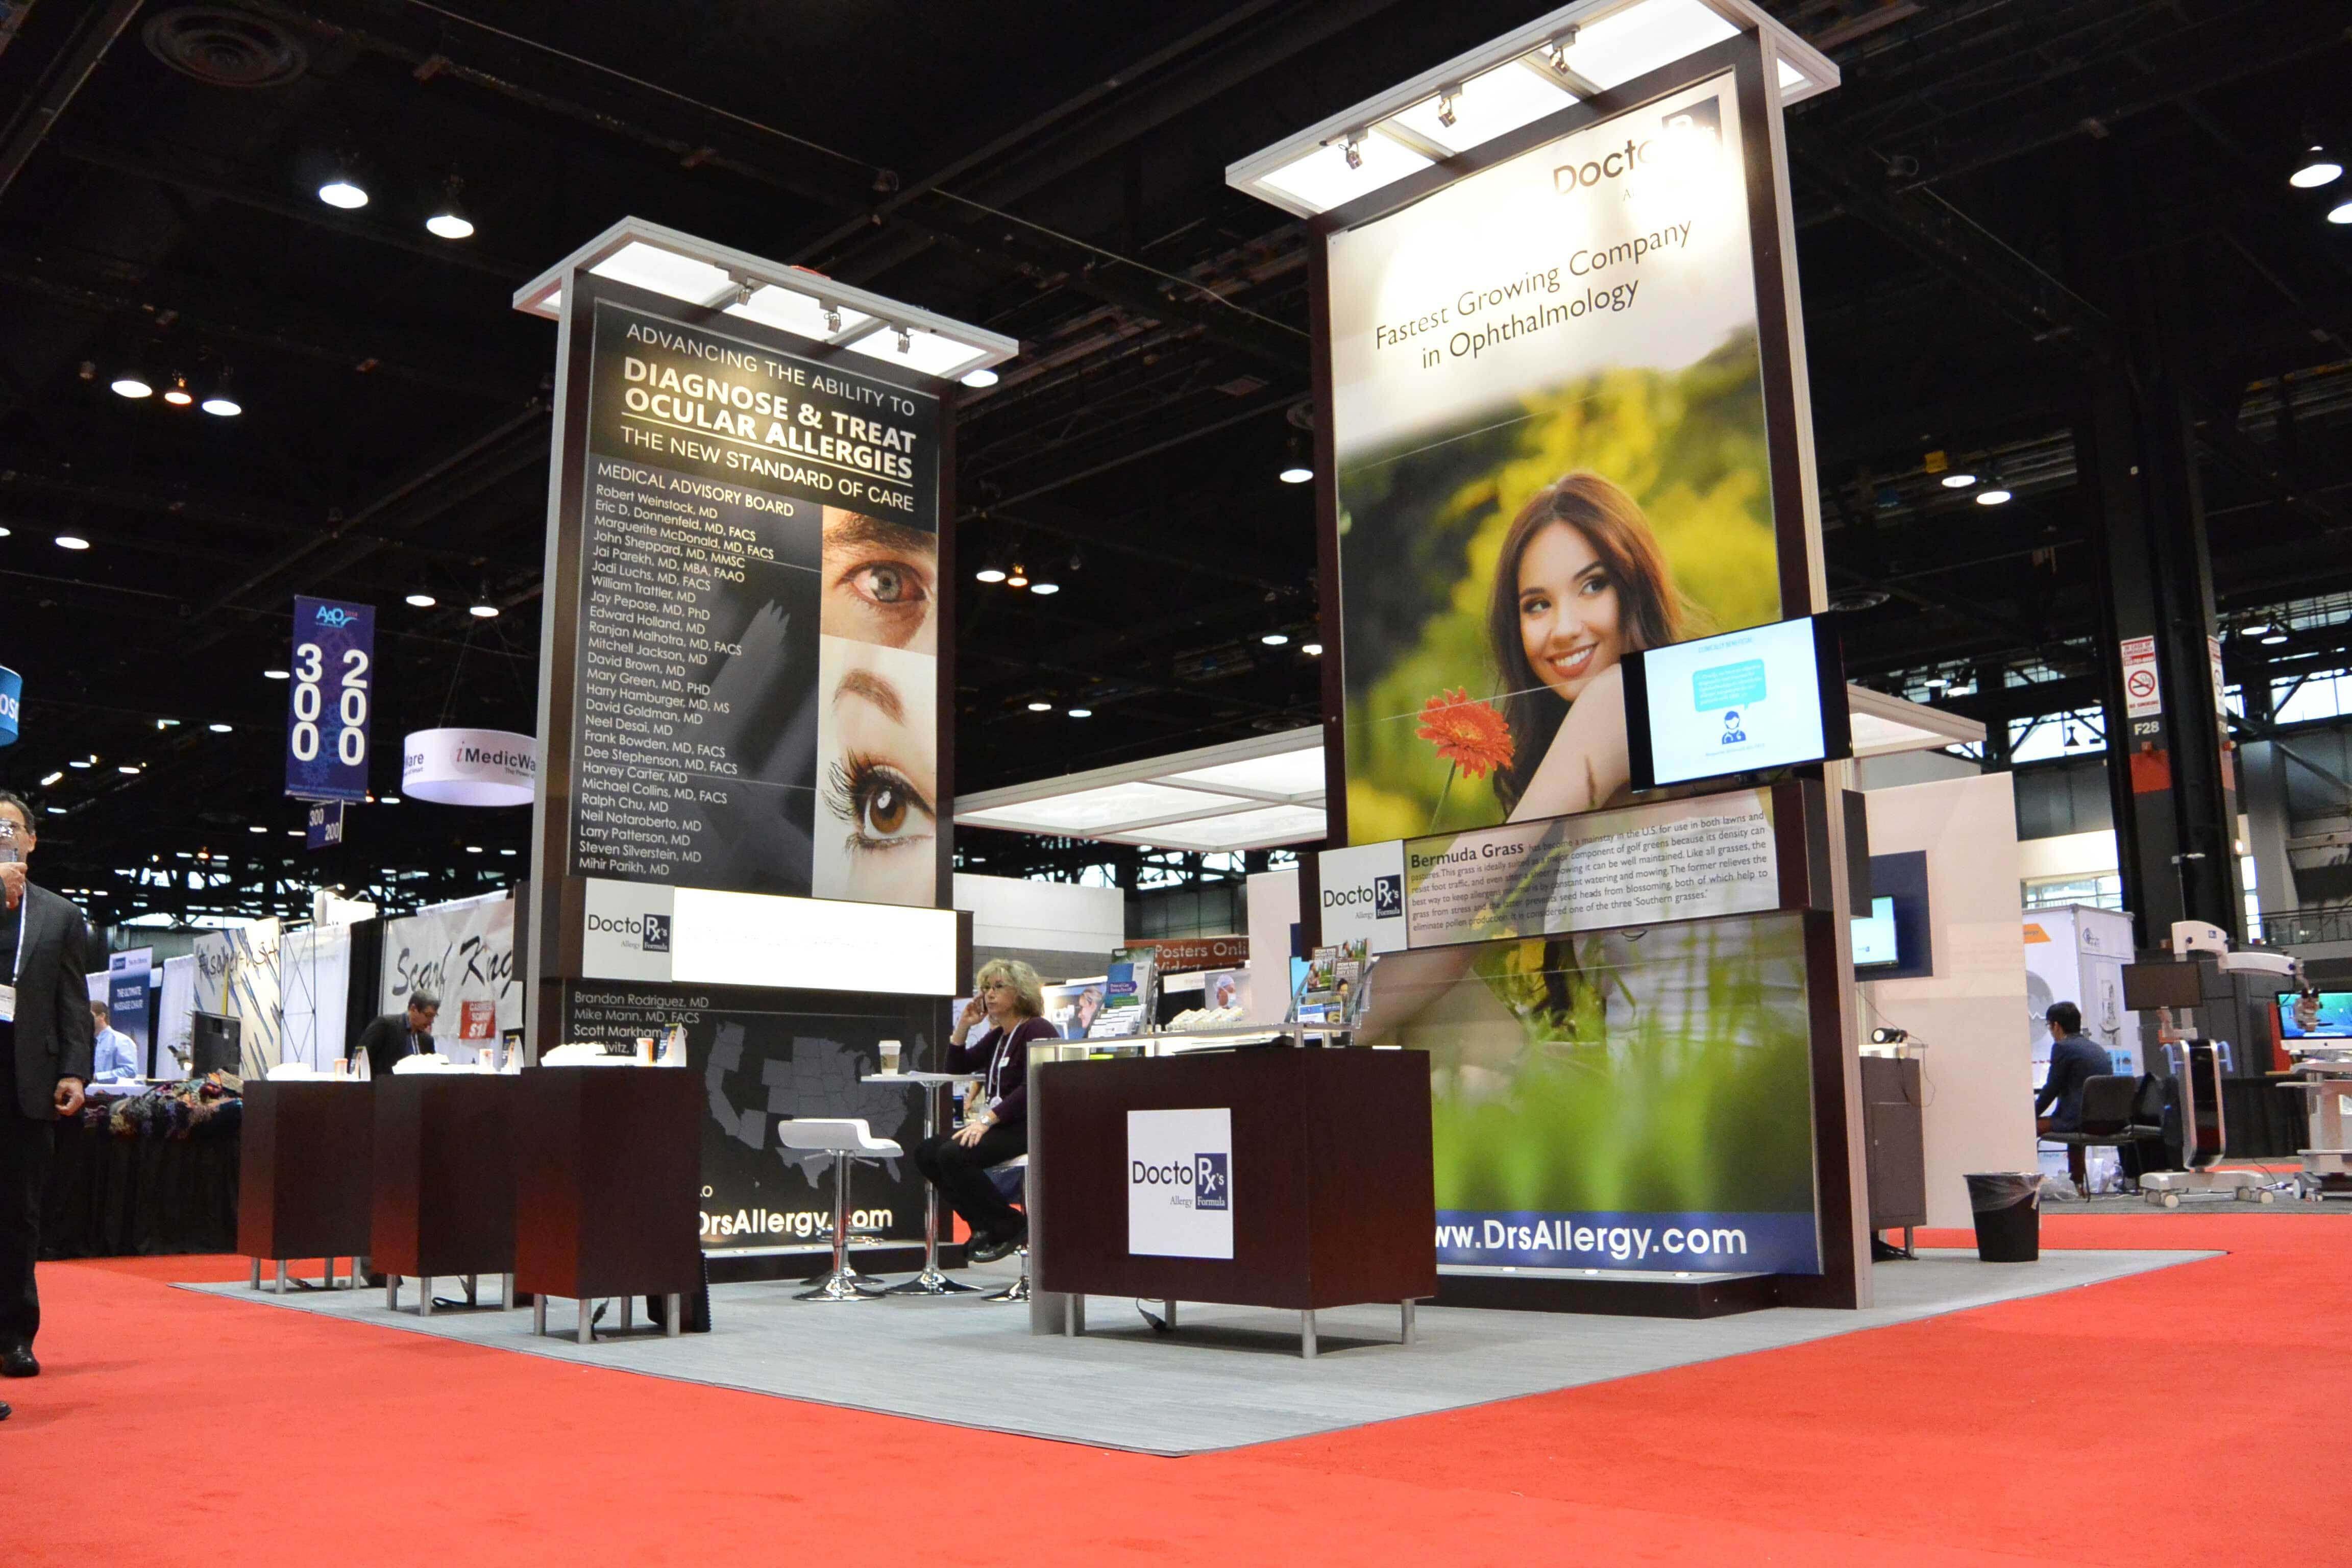 Classy Methods Booth Design